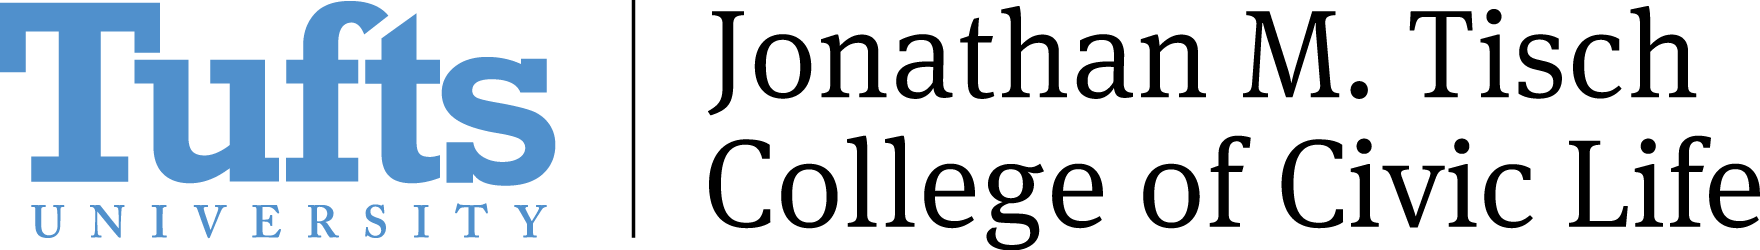 tisch-horizontal-lockup.png